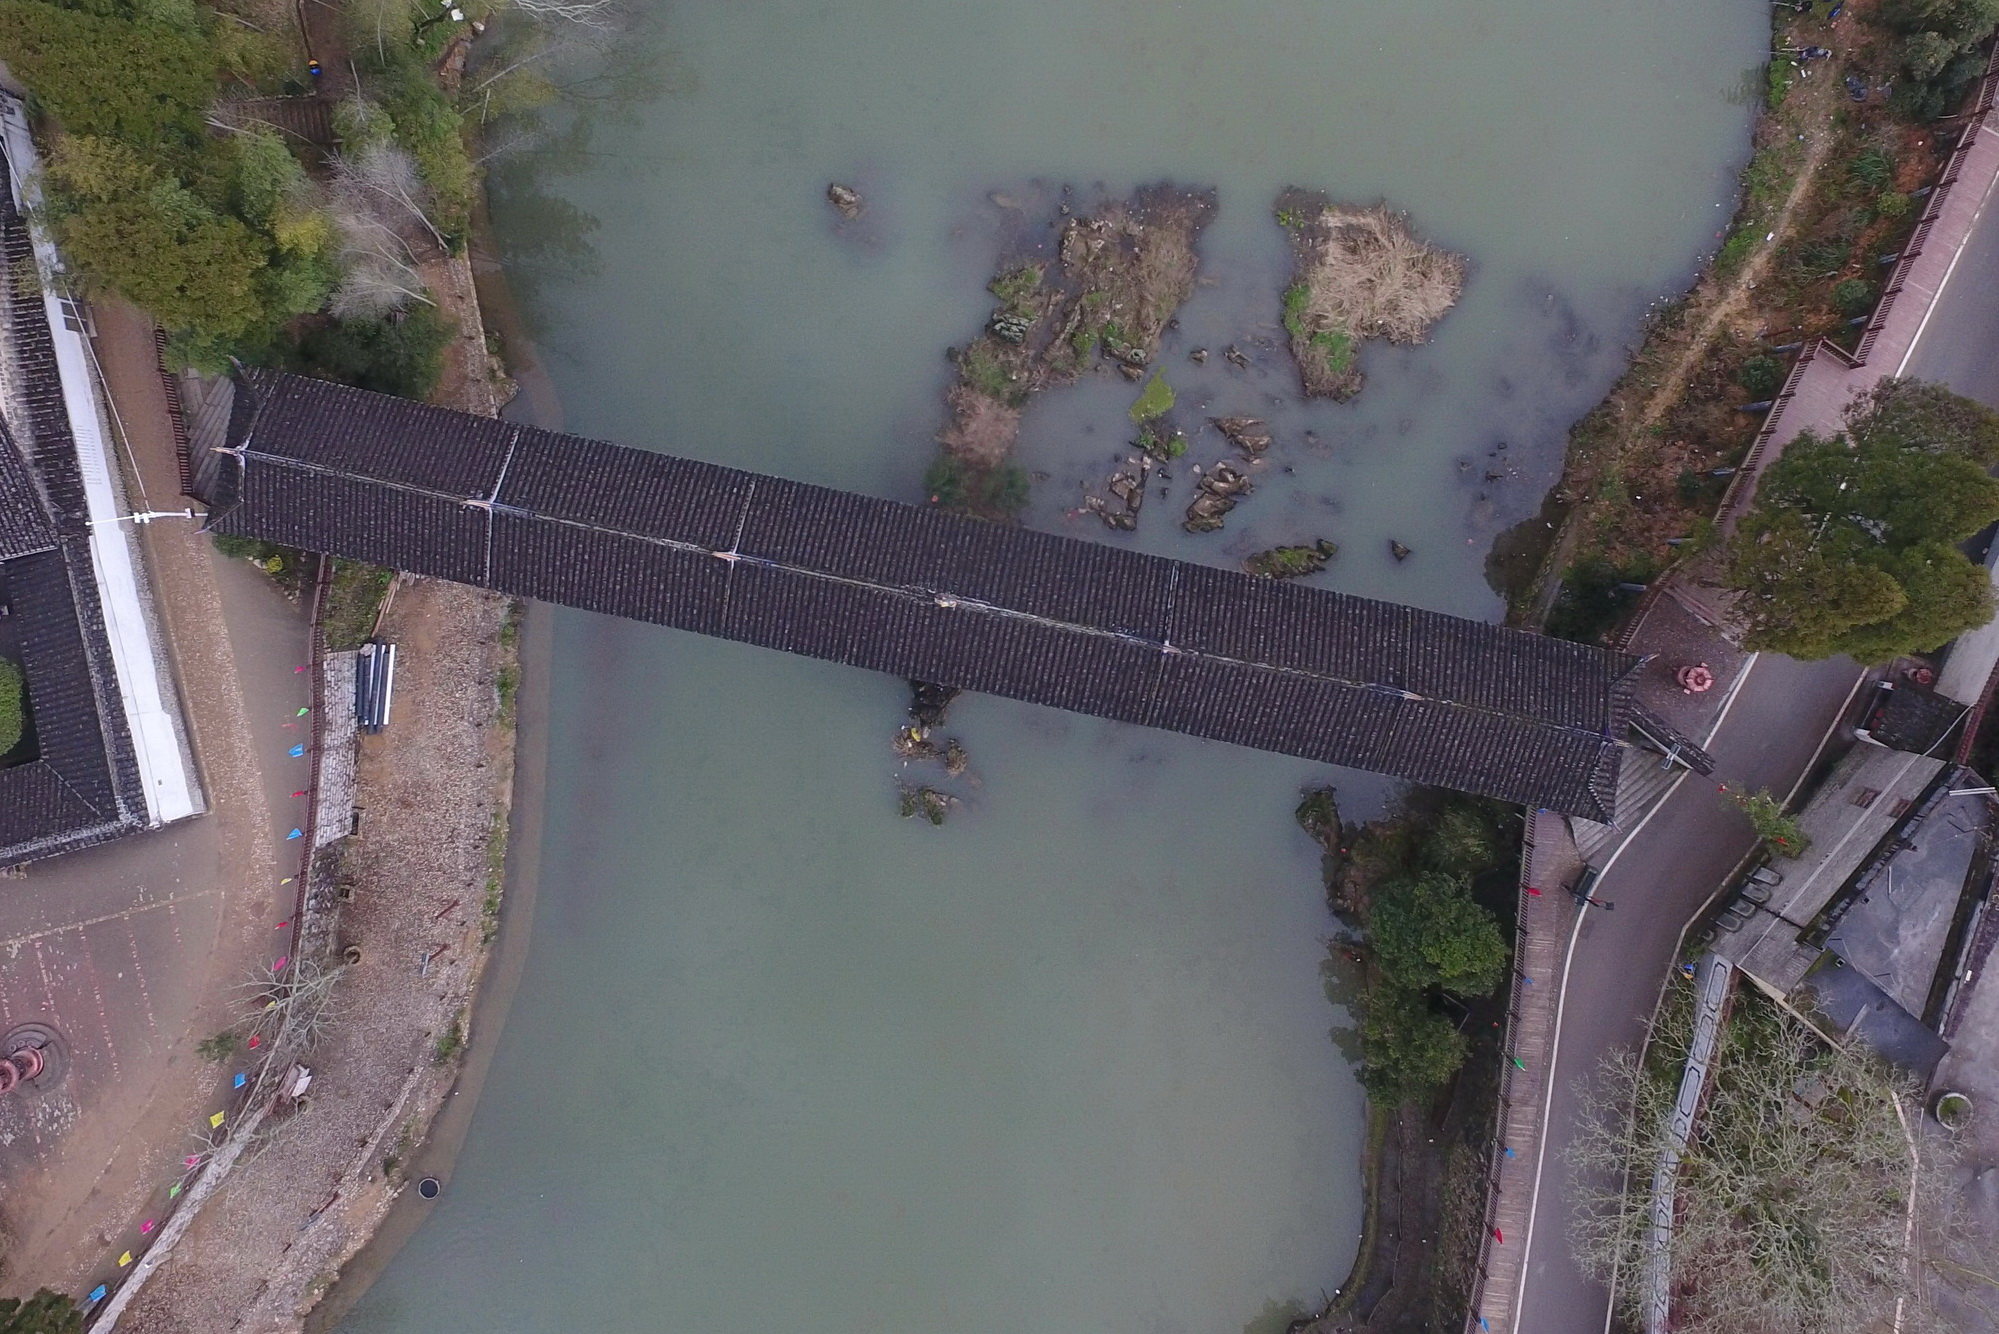 屋根付き橋「廊橋」 千年続く郷土文化の伝承